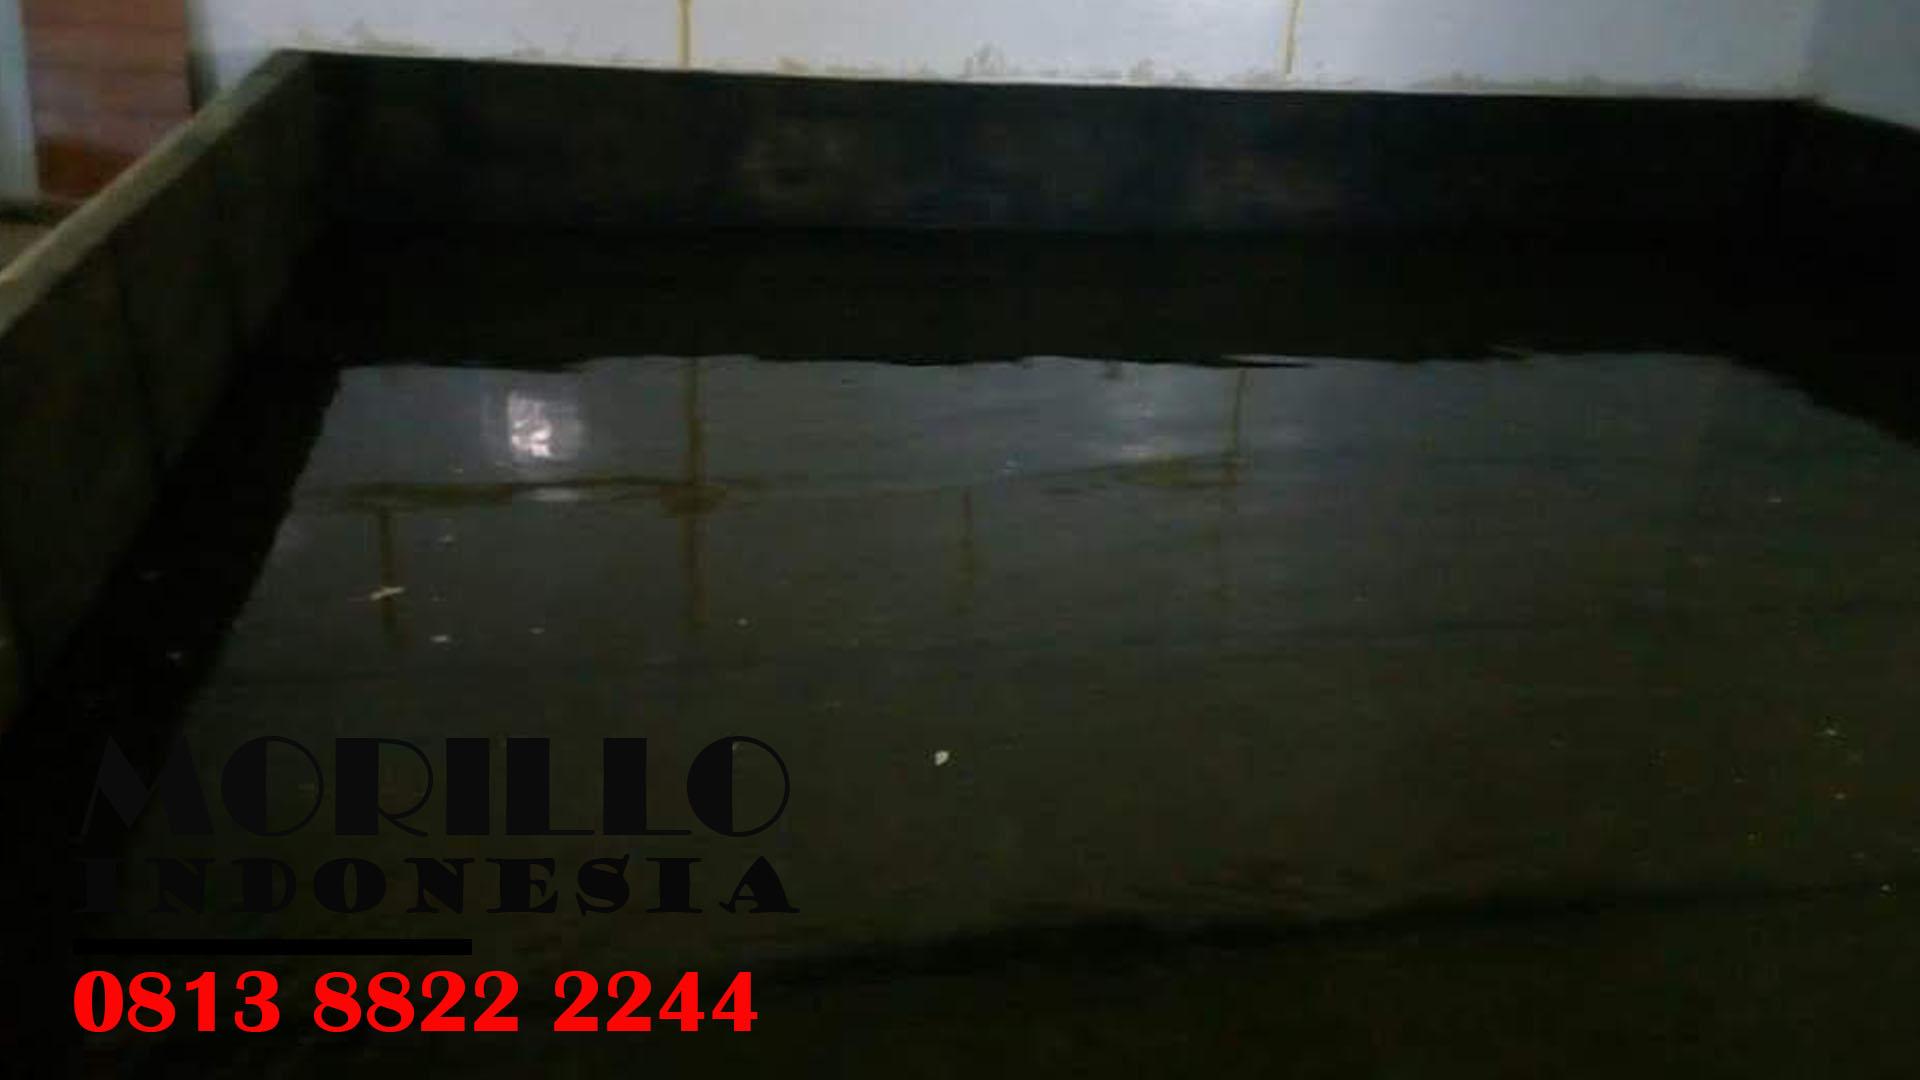 JASA WATERPROOFING MEMBRAN di JAKARTA PUSAT WA : 081388222244